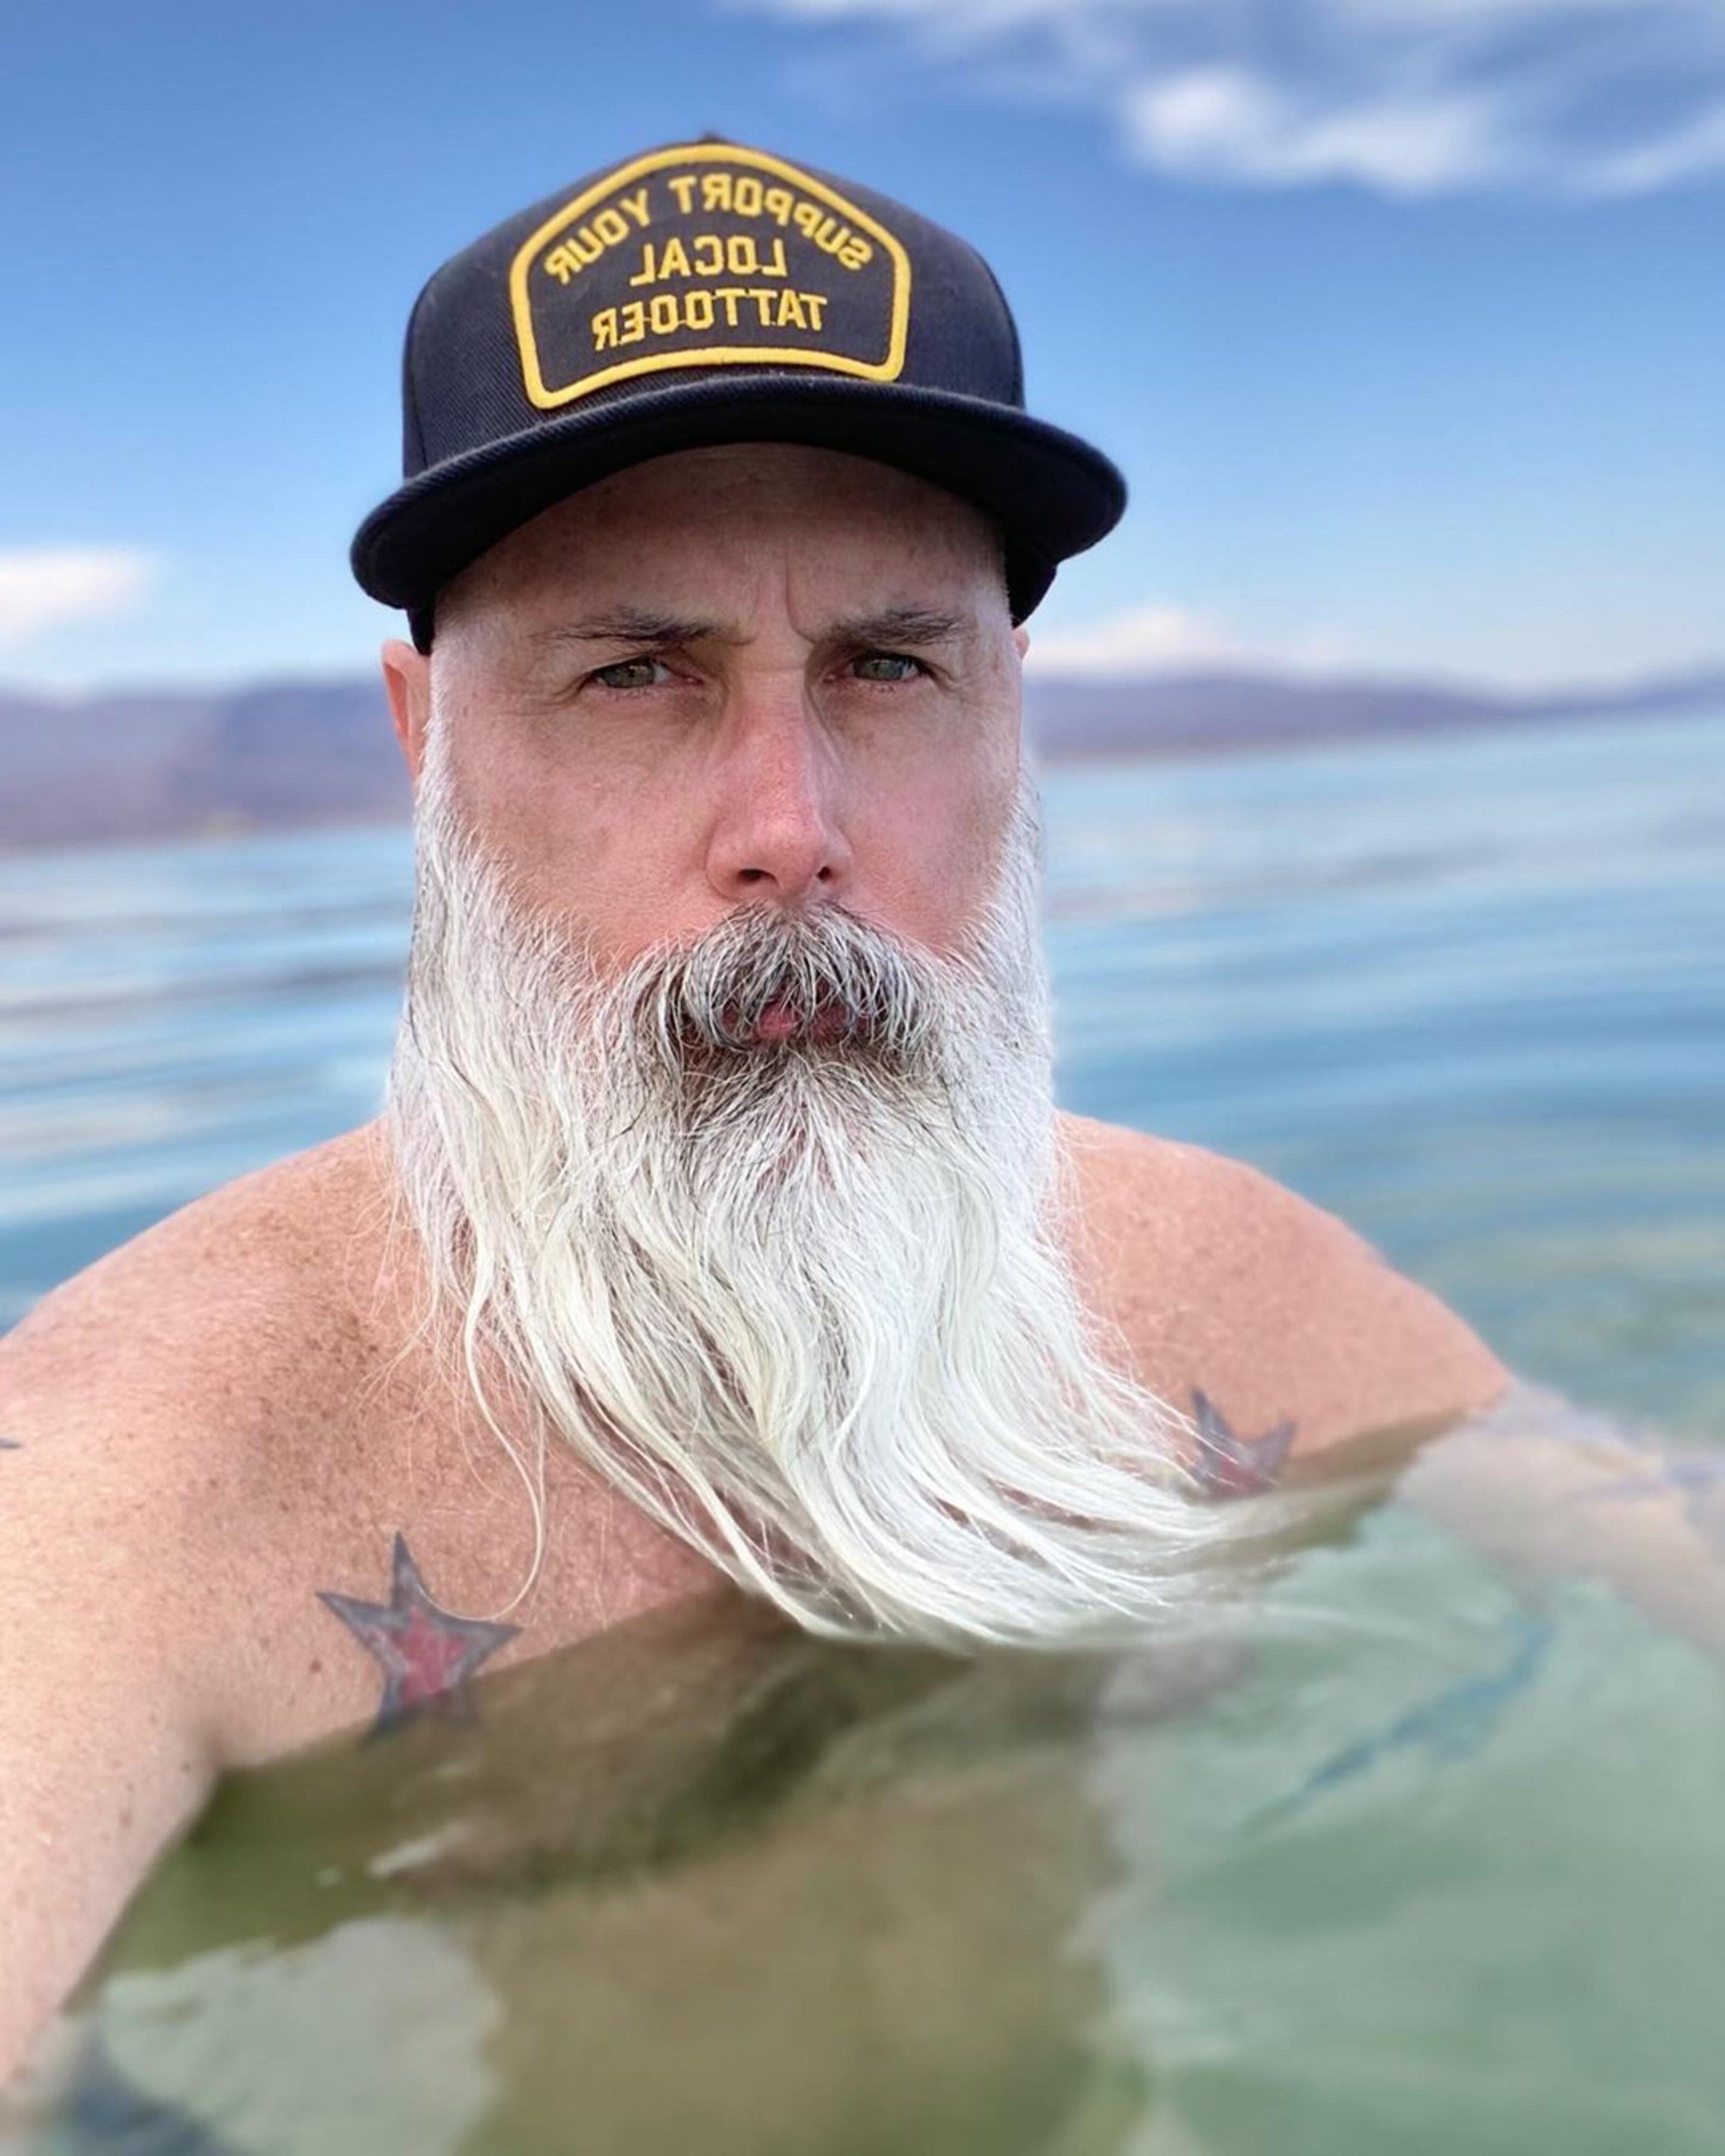 A long skinny beard look for stylish men.